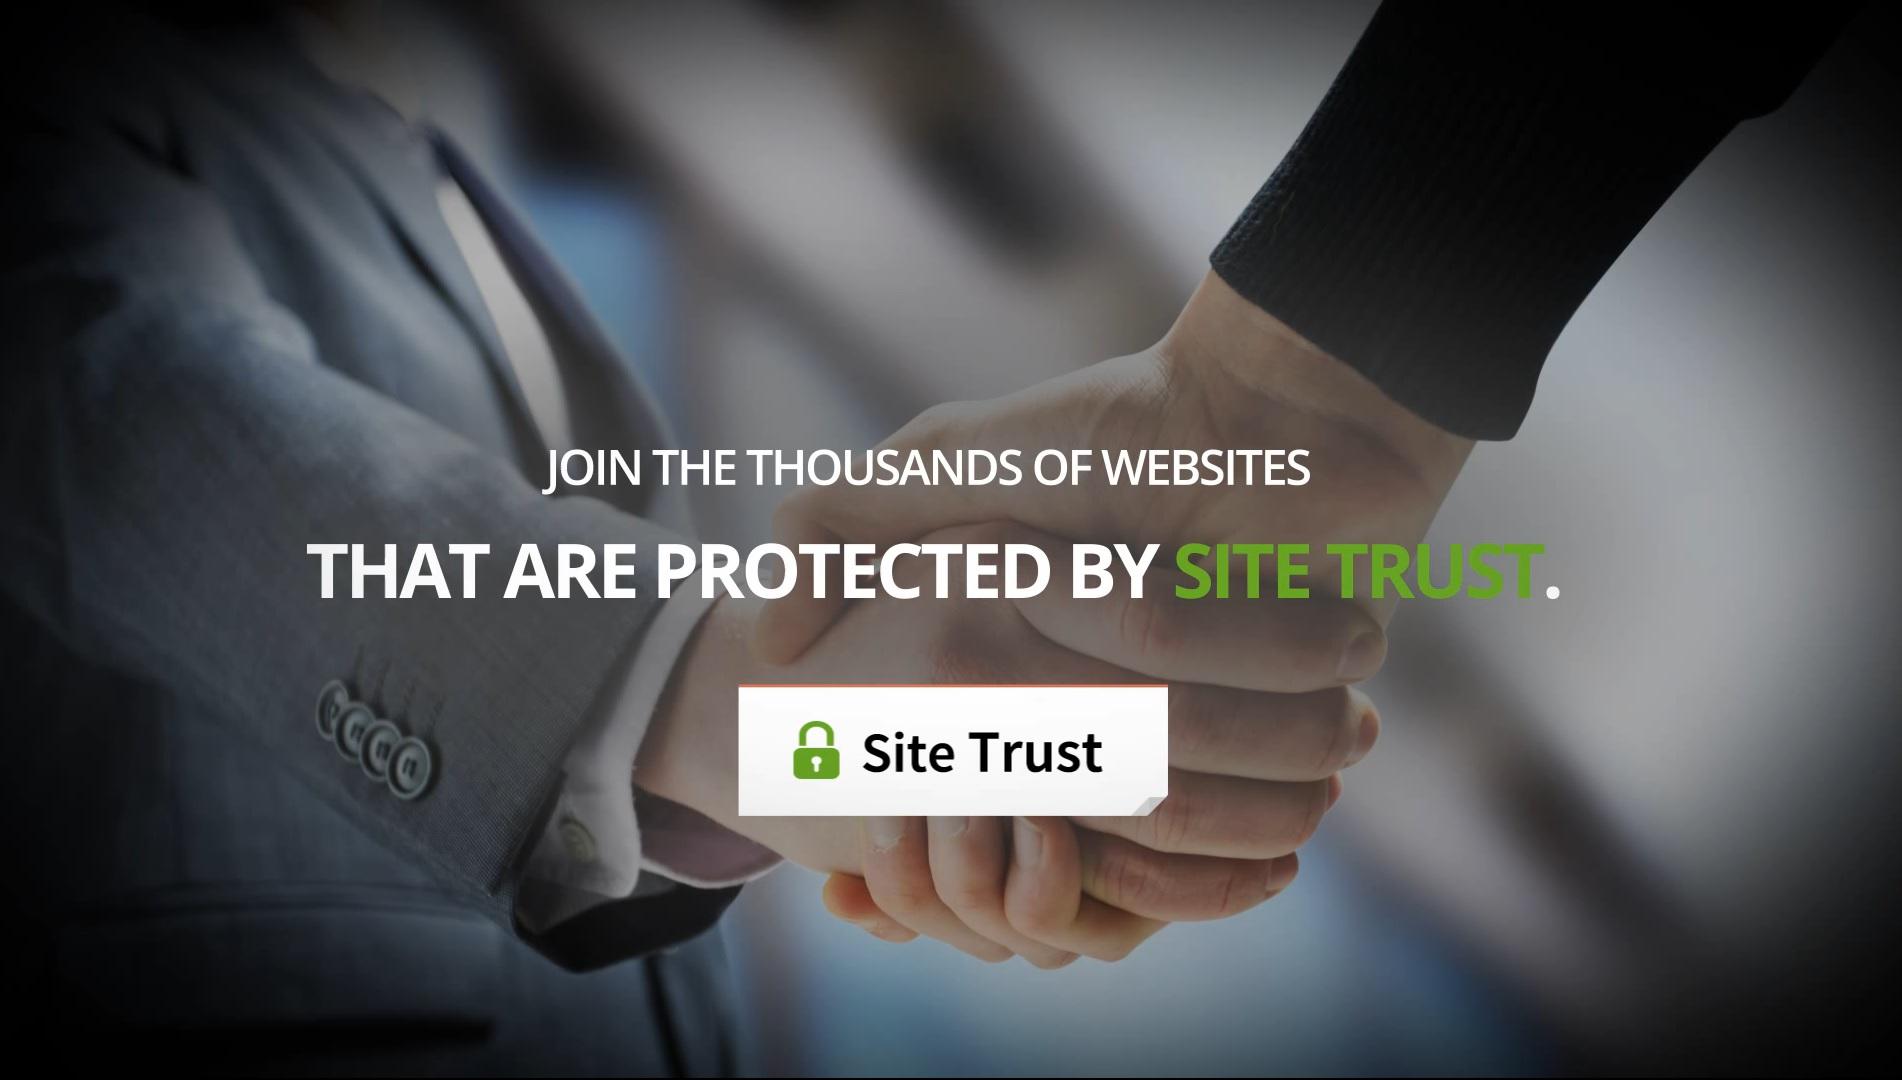 Promo video for SiteTrust